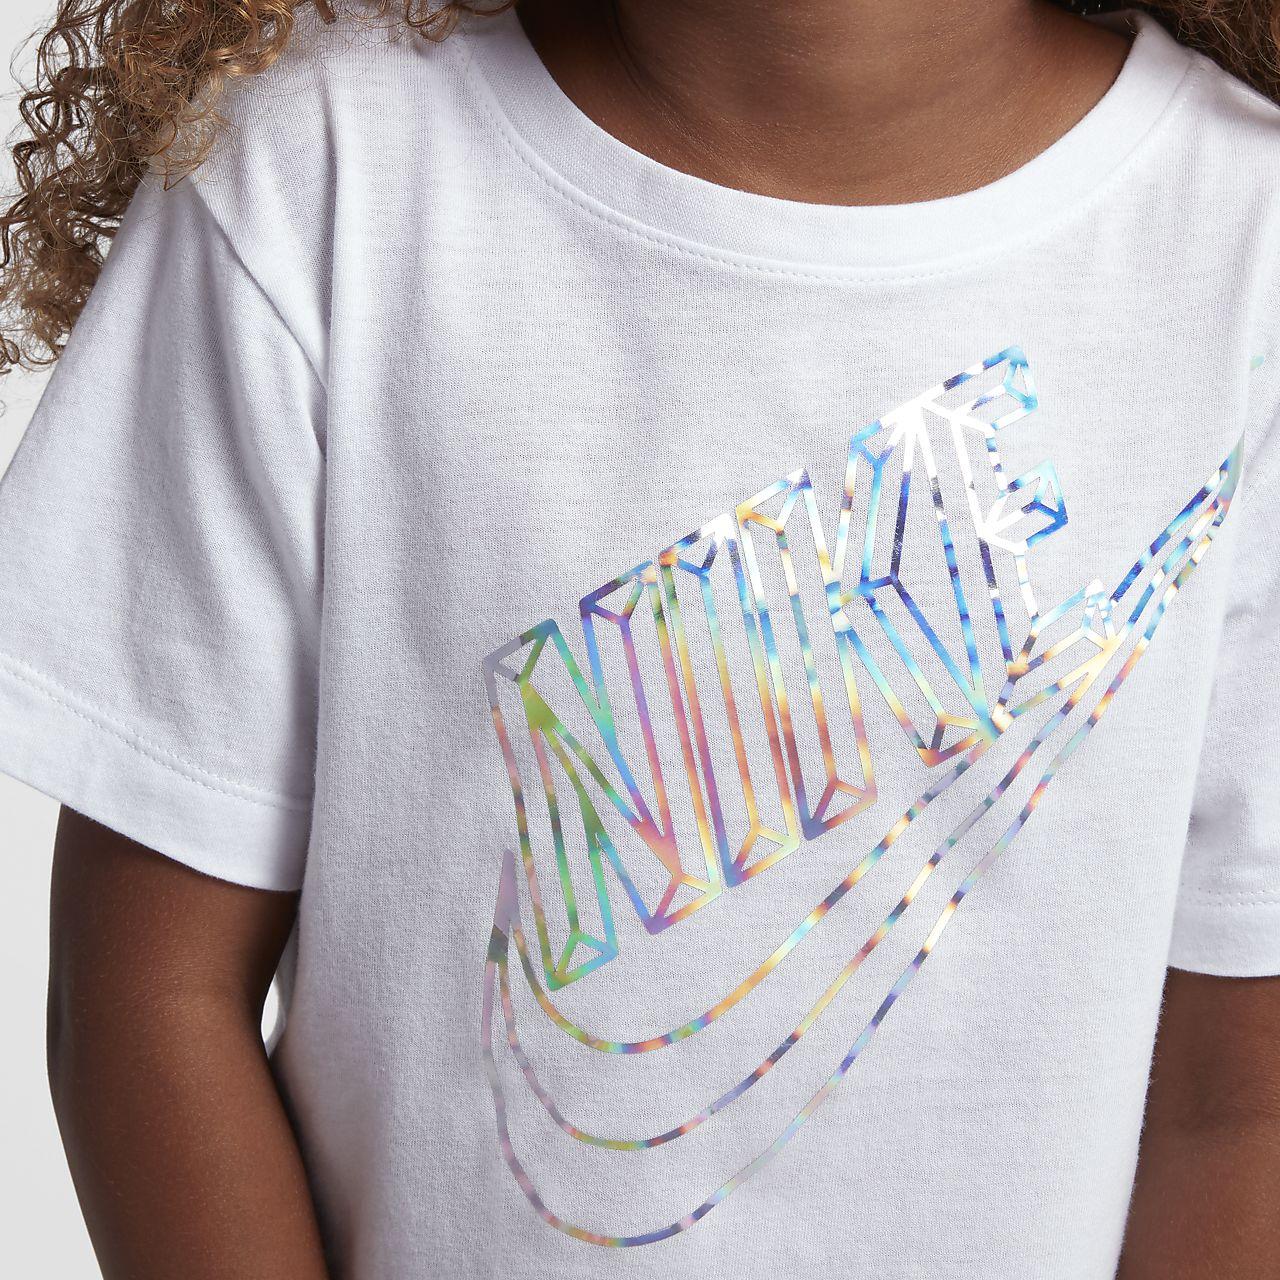 36597be0b3 Low Resolution Nike Sportswear póló kisebb gyerekeknek Nike Sportswear póló  kisebb gyerekeknek